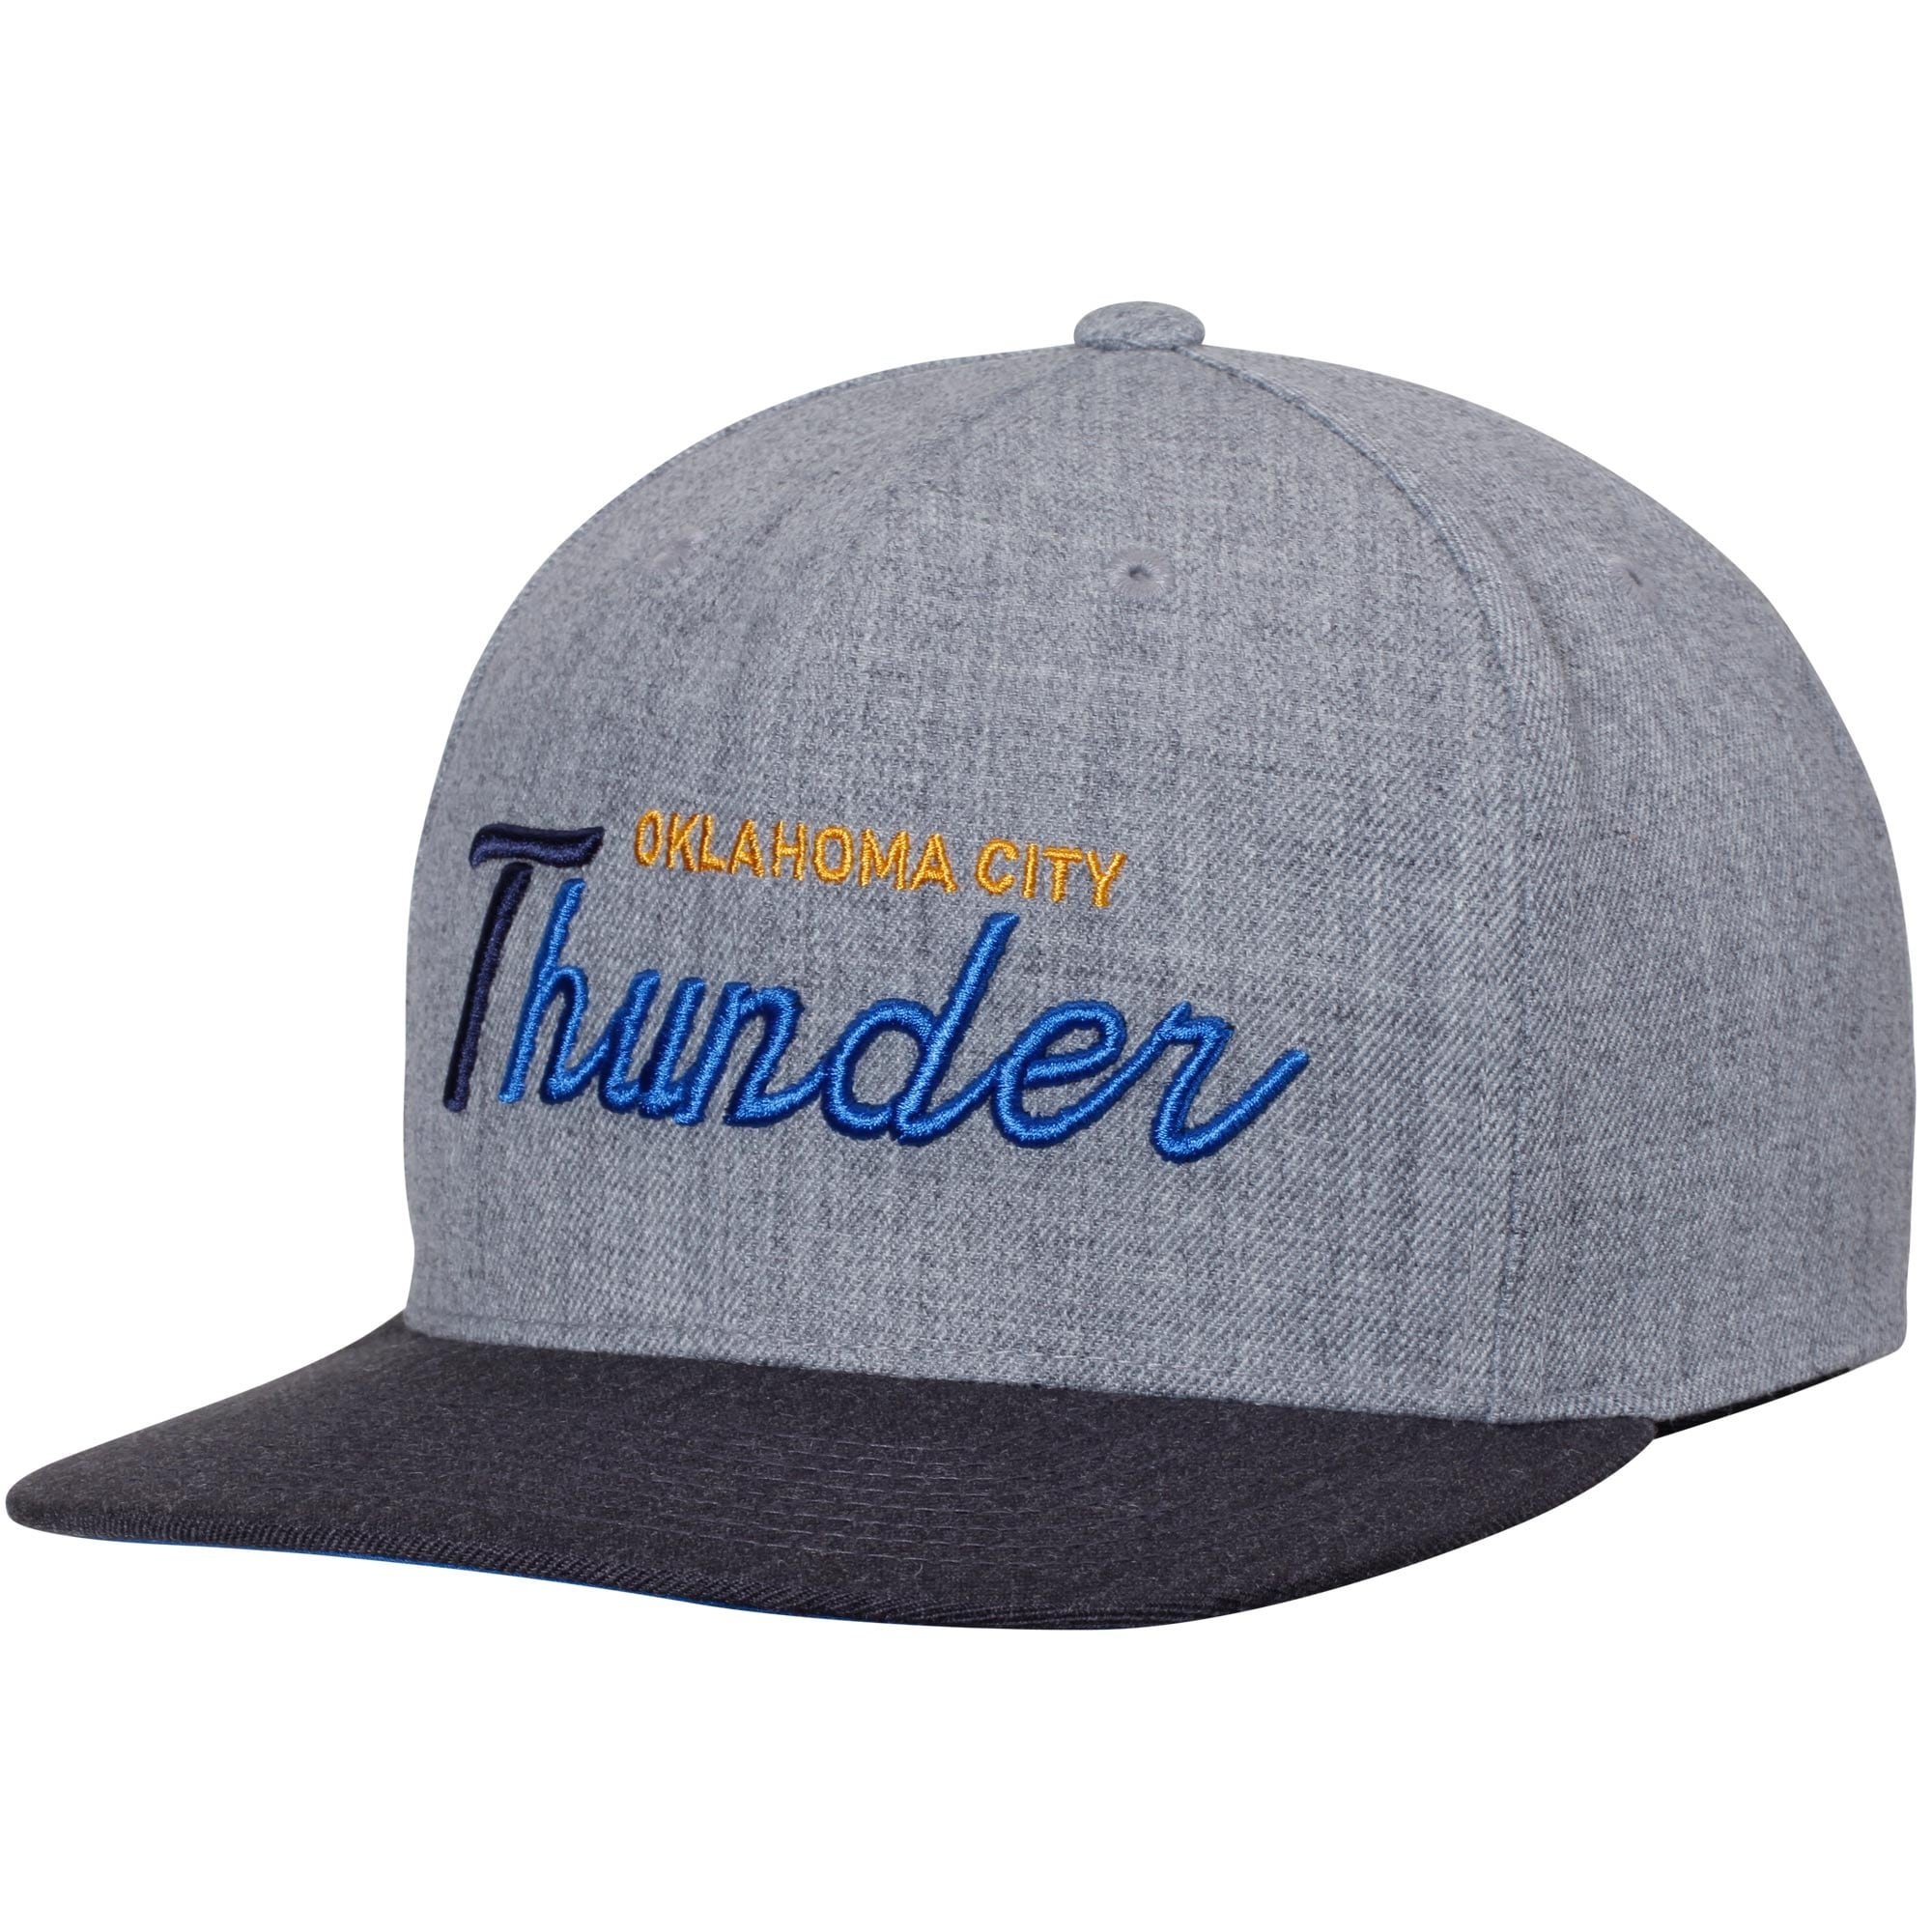 Oklahoma City Thunder Mitchell & Ness Tri-Pop Special Script Adjustable Snapback Hat - Gray